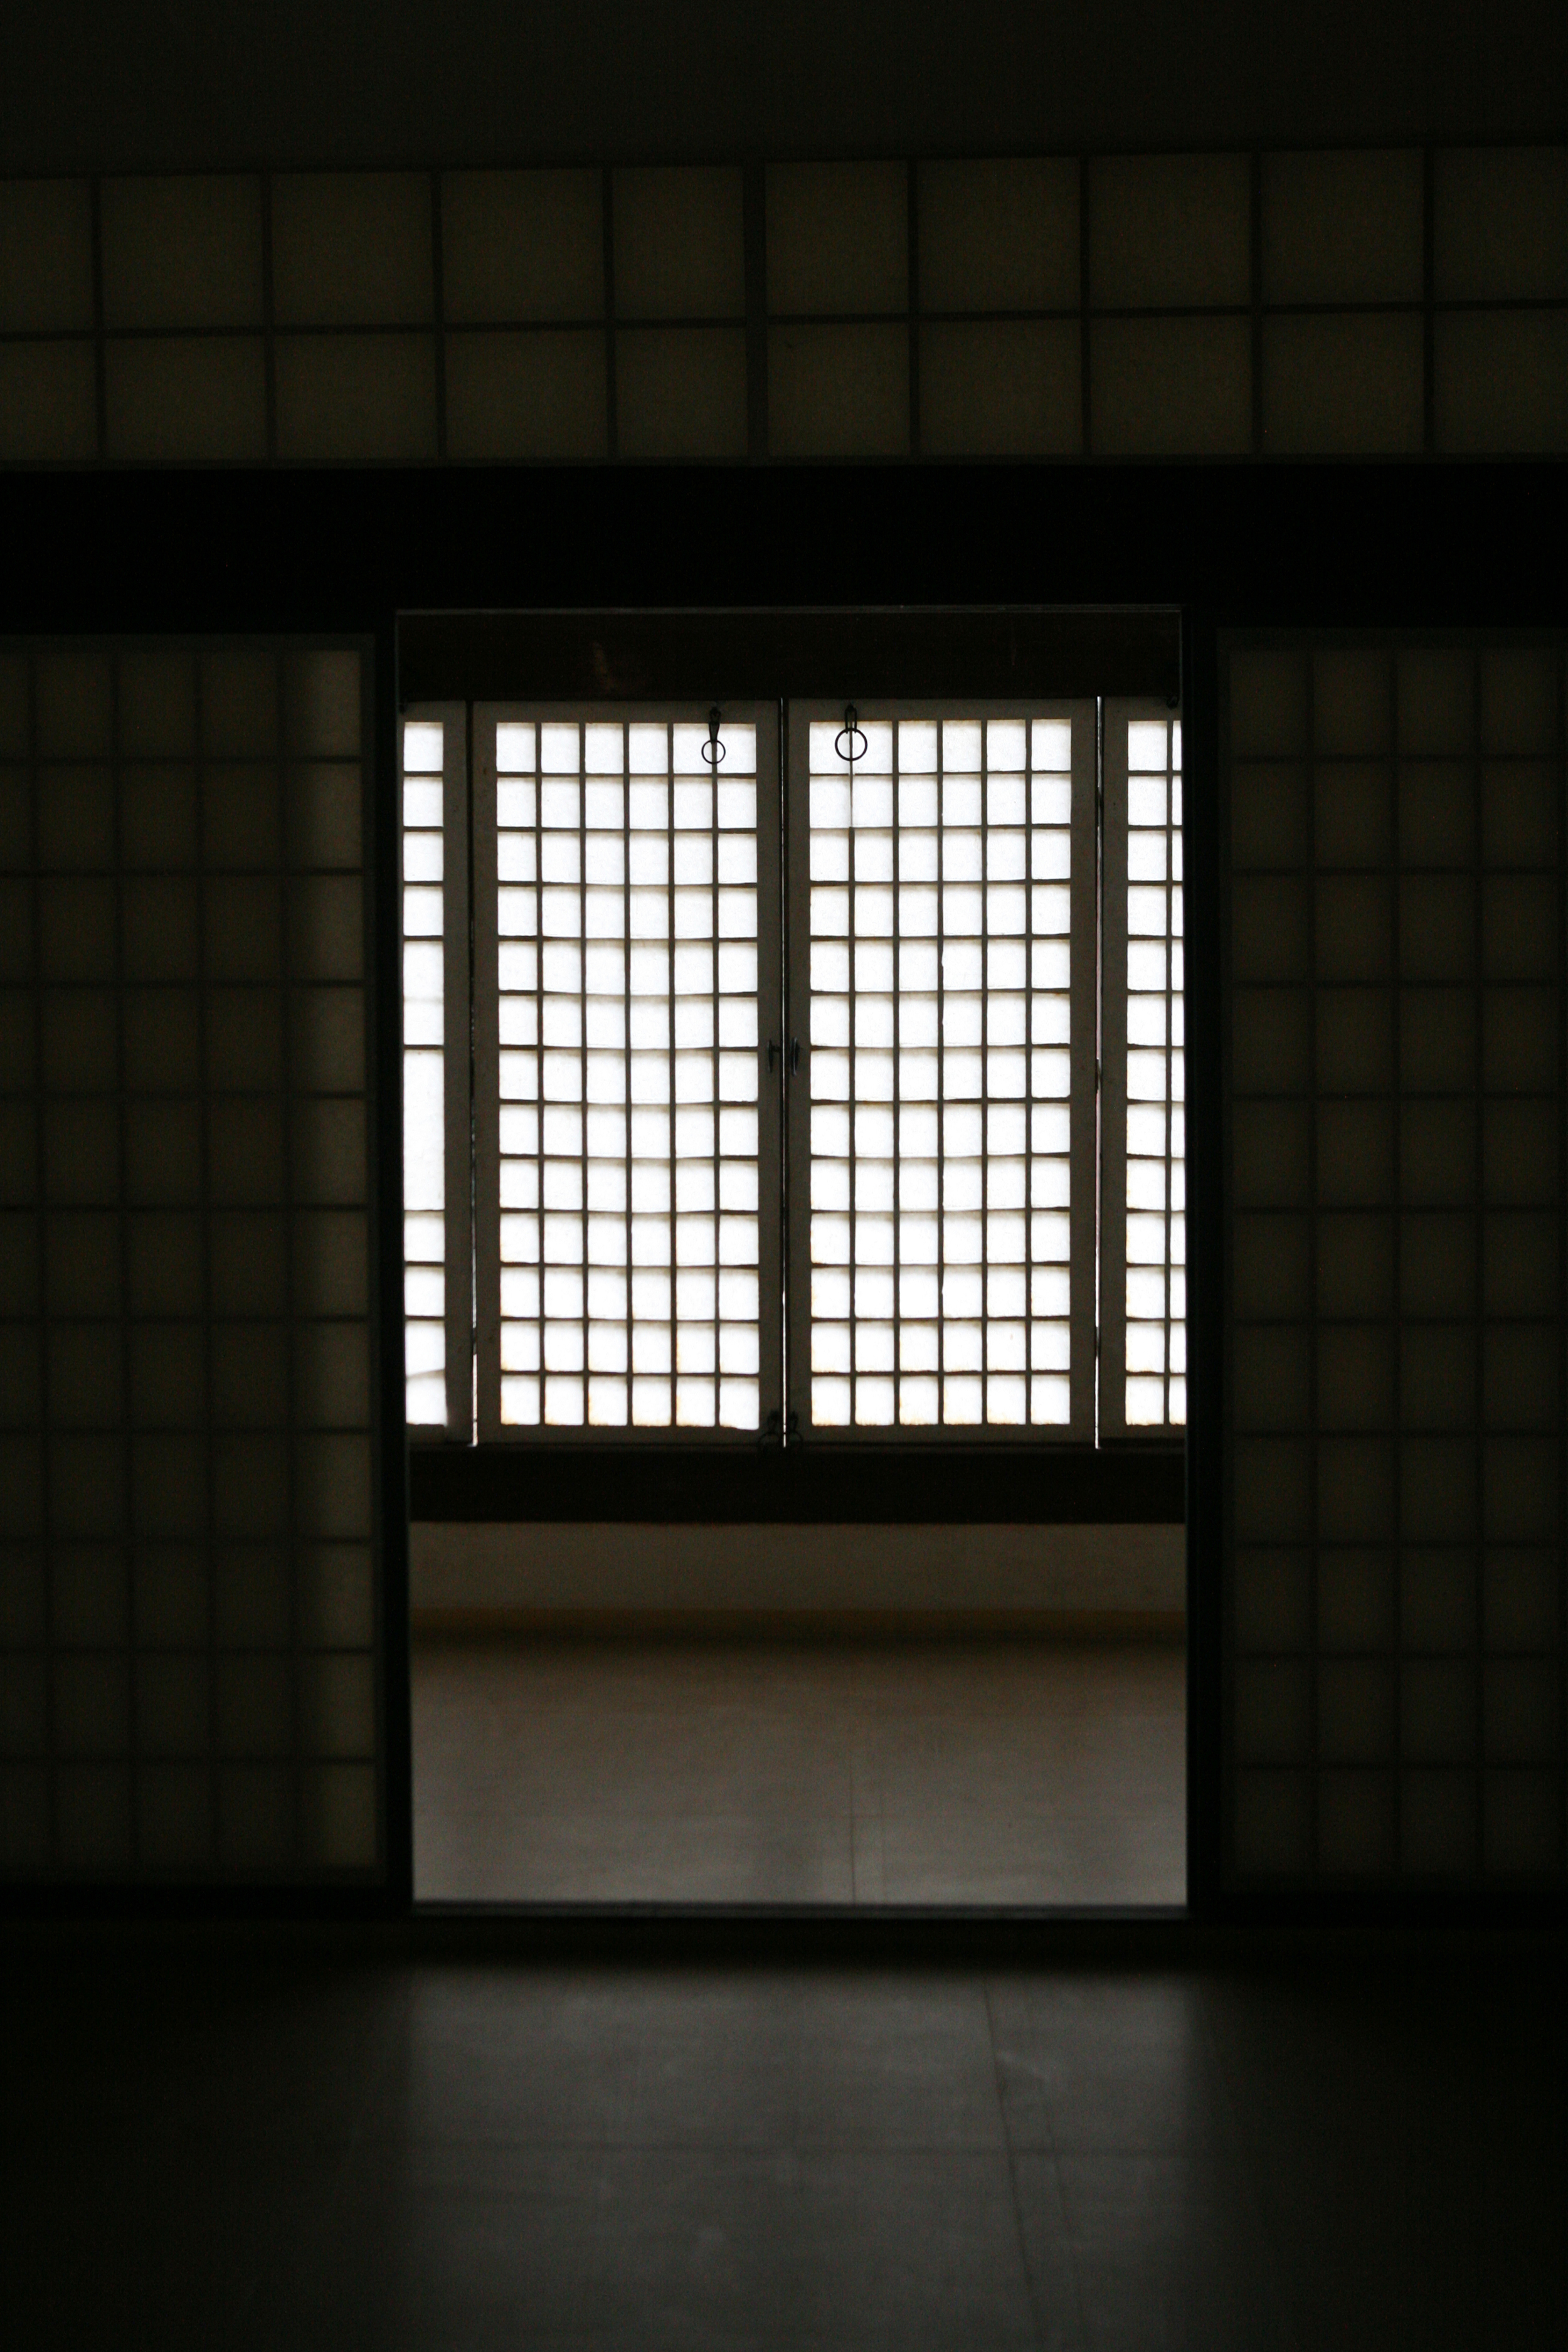 Someone's window _Korea-.jpg